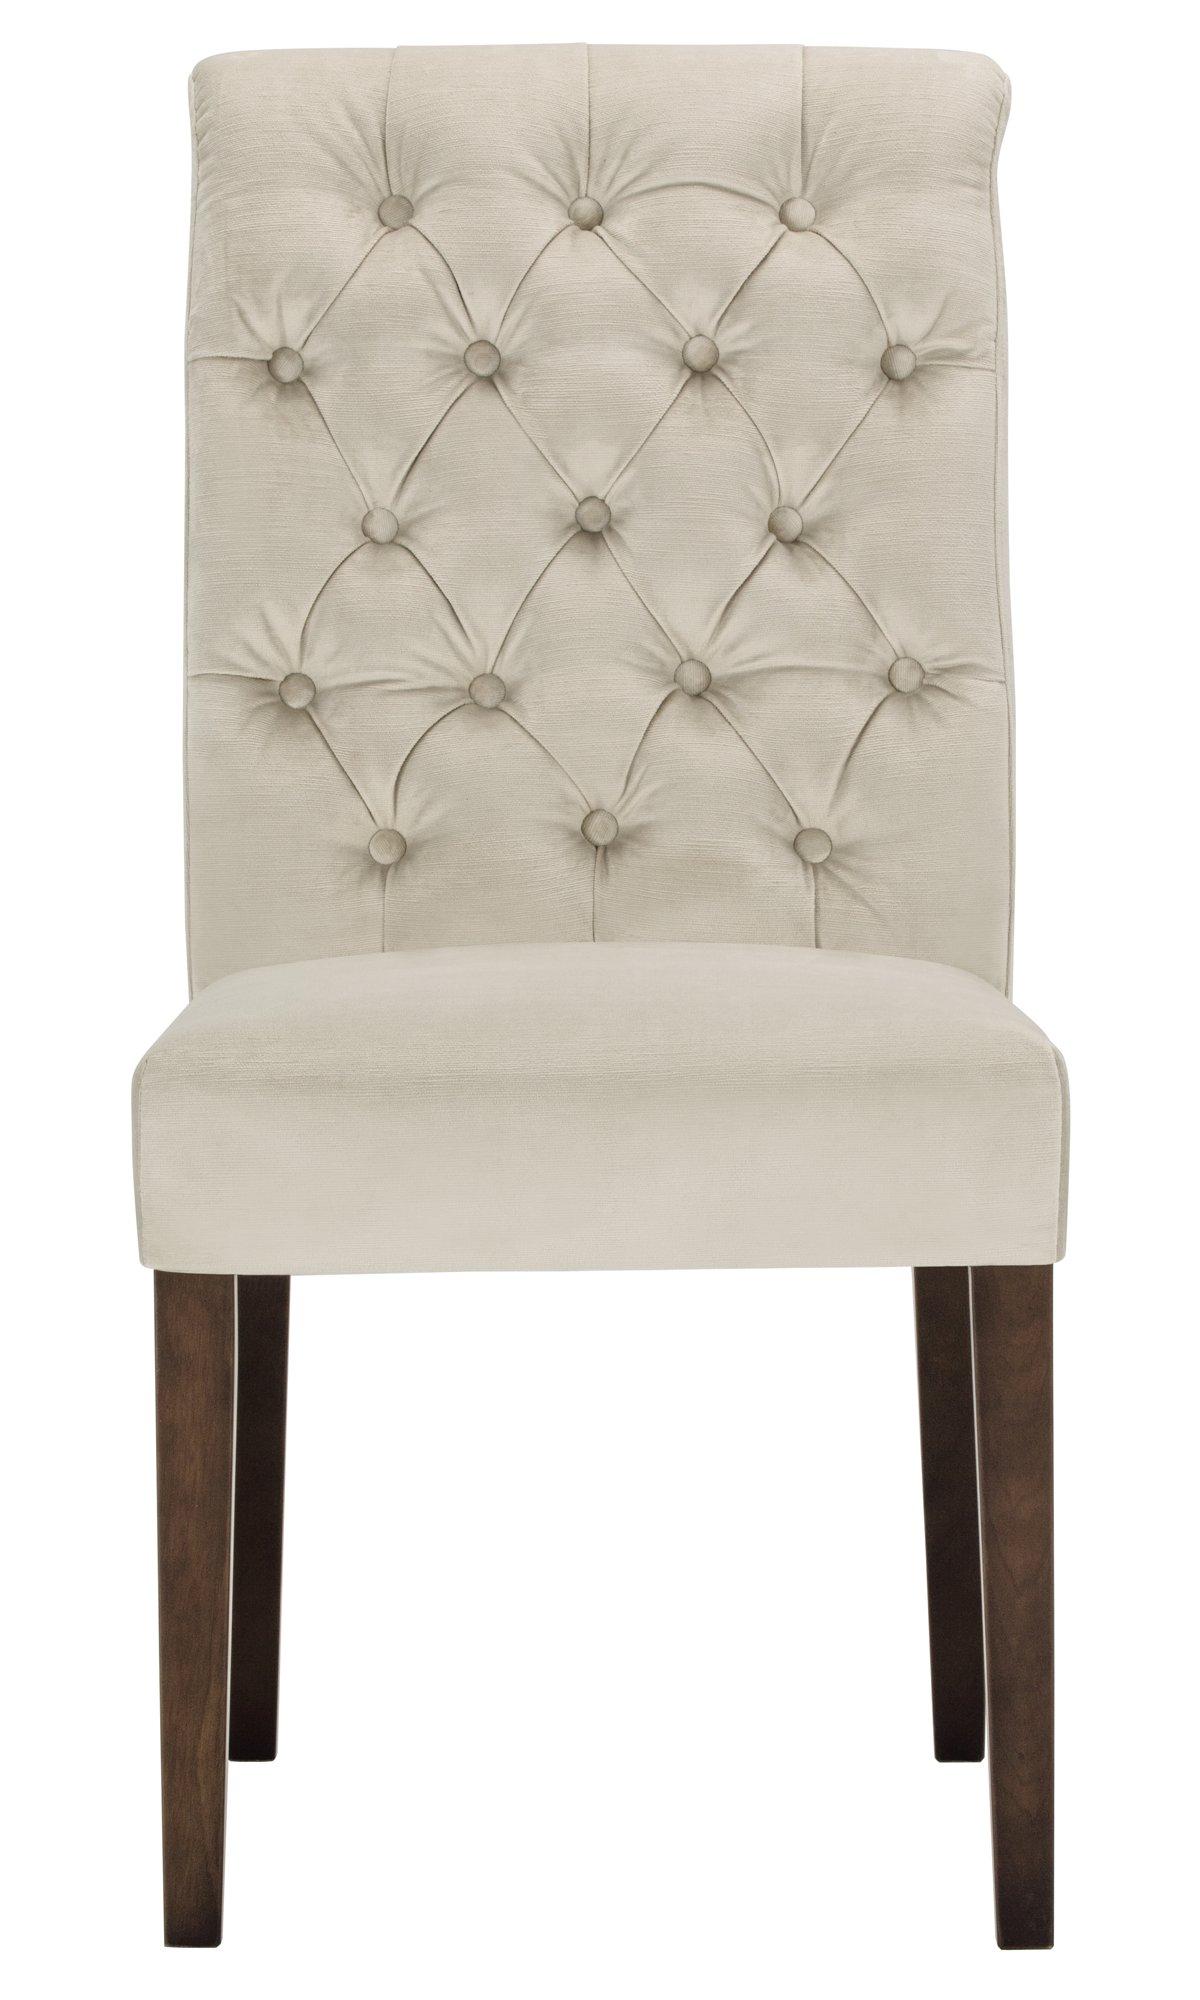 city furniture sloane lt beige rectangular table 4 chairs bench sloane light beige rectangular table 4 chairs bench